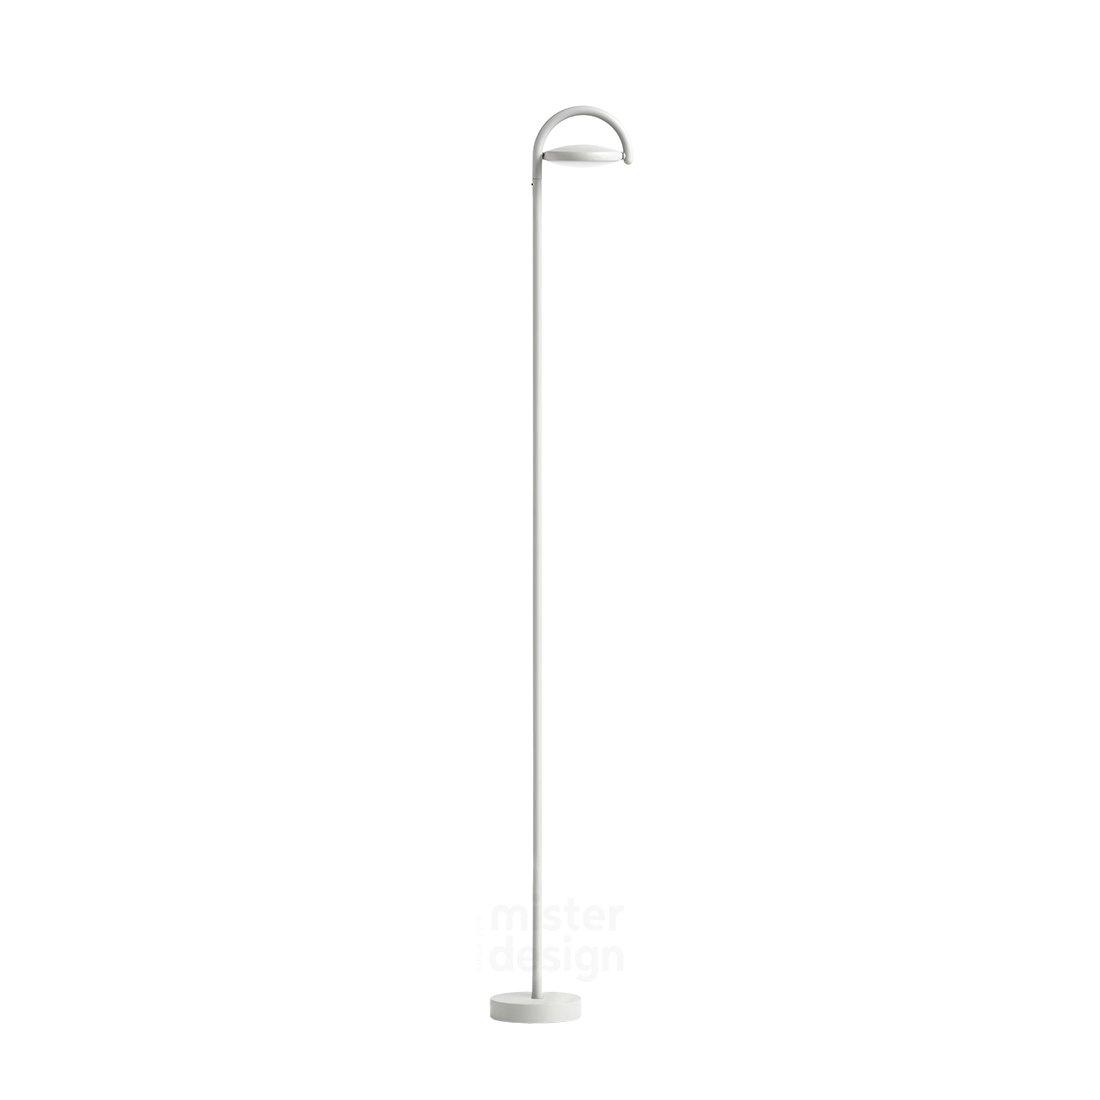 HAY Marselis Vloerlamp - Asgrijs